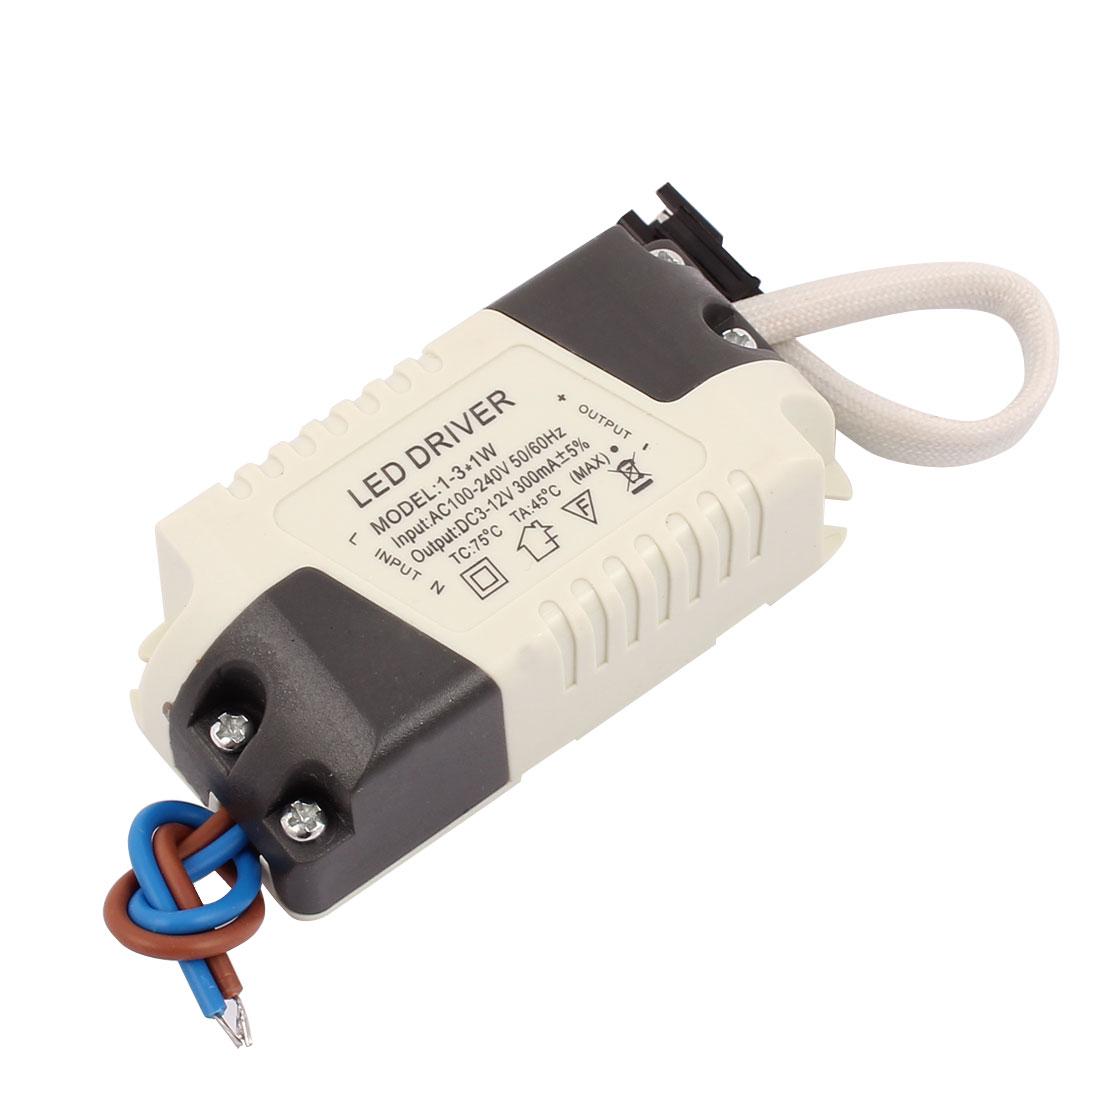 AC 100-240V 50/60Hz to DC 3-12V 300mA LED Strip Driver Power Supply